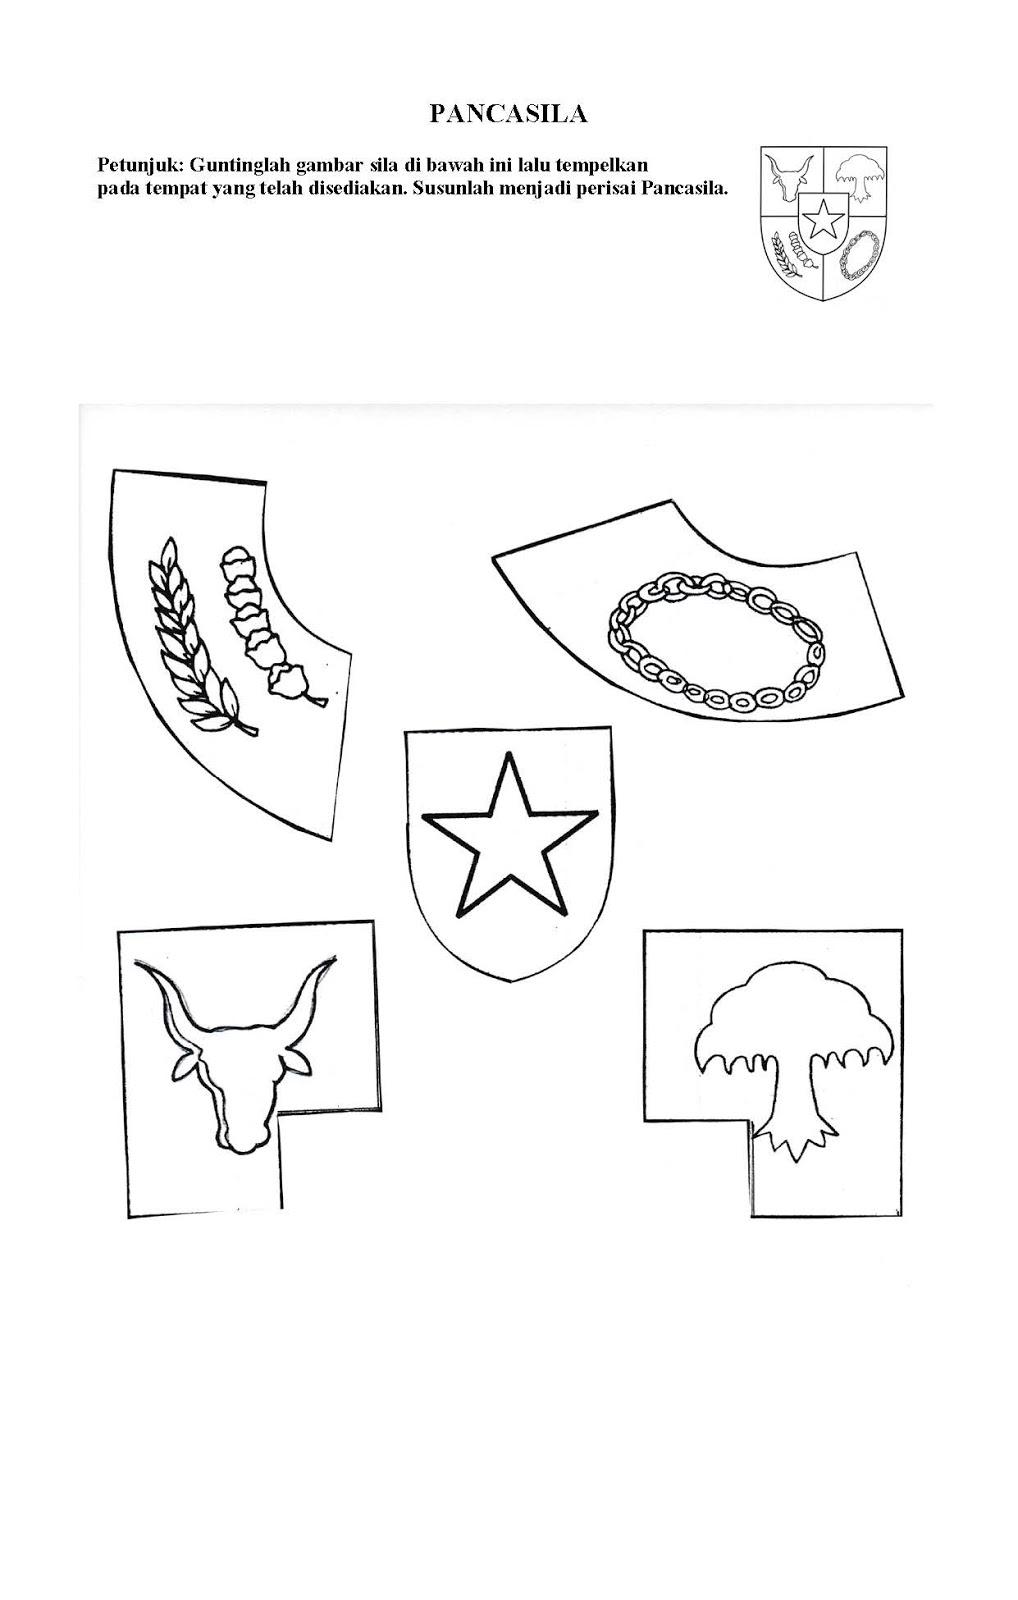 Worksheets Worksheet-anak-tk im happy now in paud pendidikan anak usia dini preschool lks lembar kerja siswa tanah airku my country theme worksheet